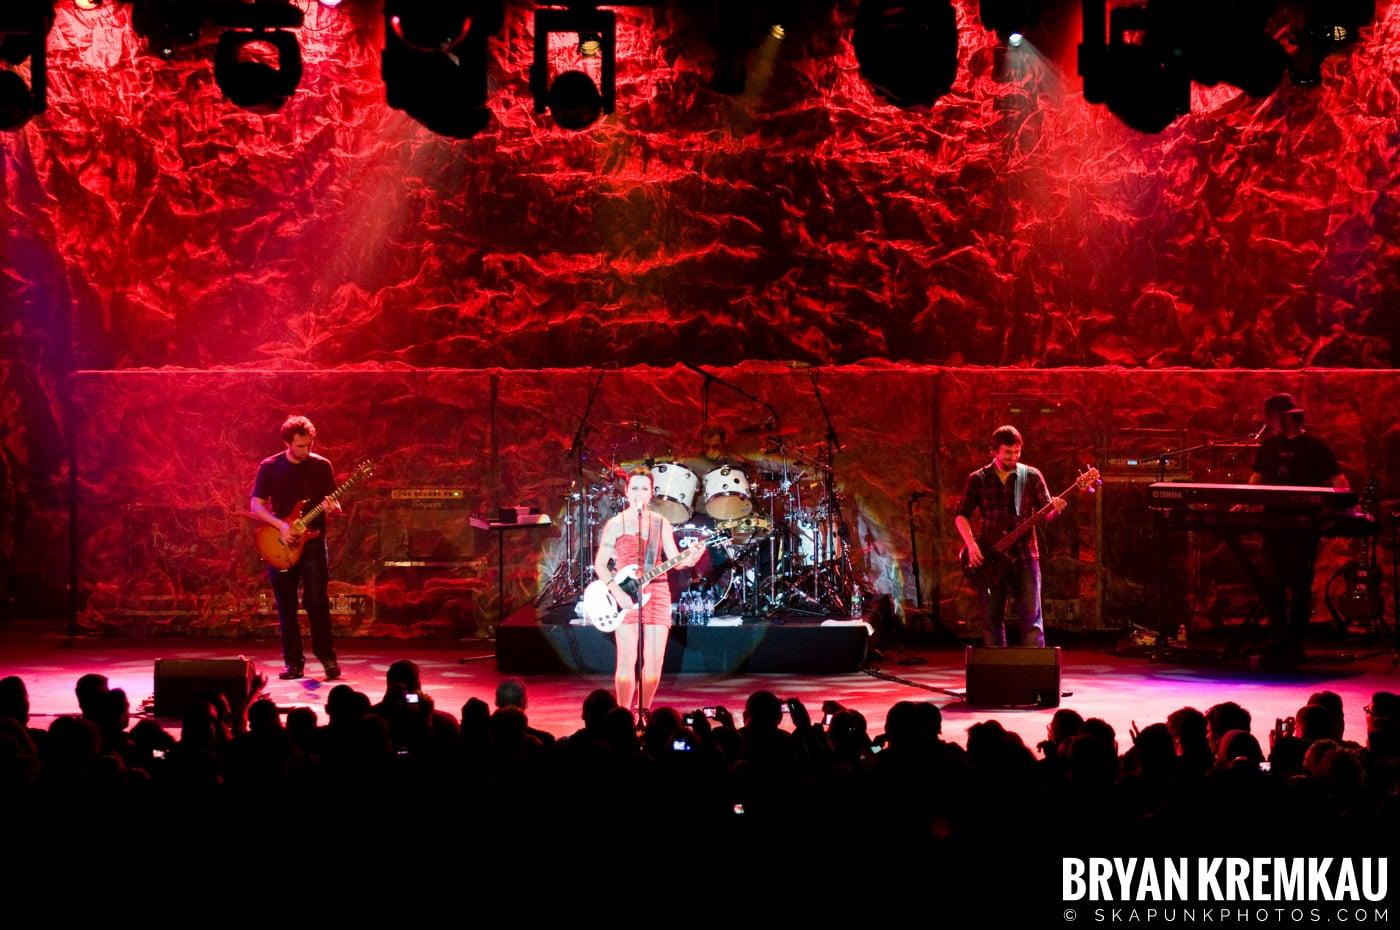 The Cranberries @ Nokia Theatre, NYC - 11.18.09 (3)